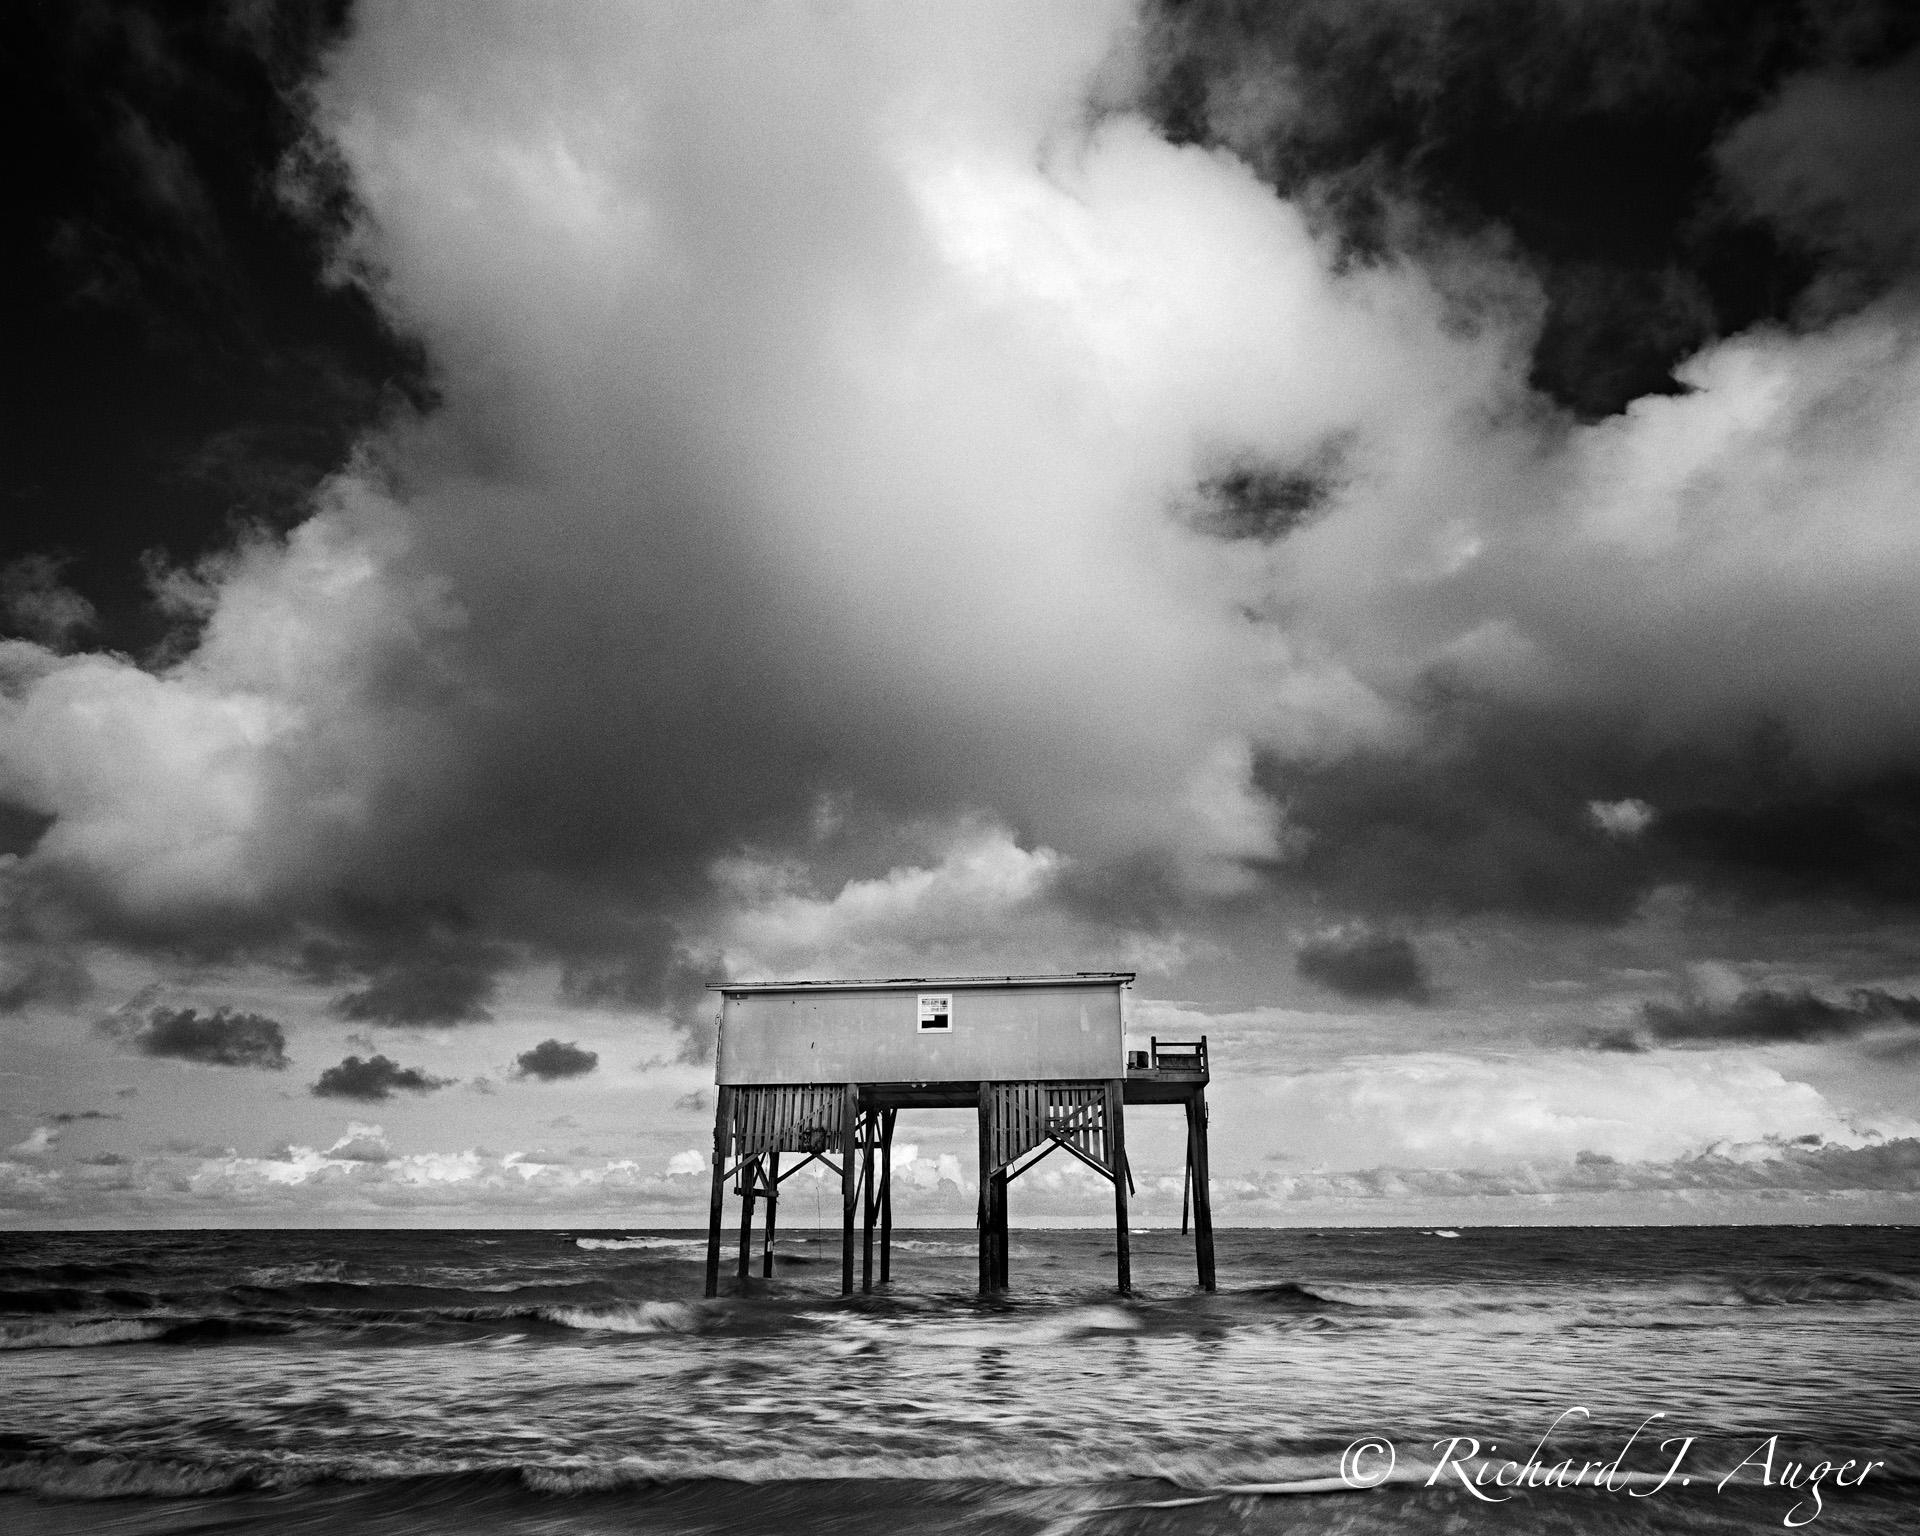 Hunting Island, South Carolina, Fishing Shack, Stilt House, Black and White, storm, ocean, waves